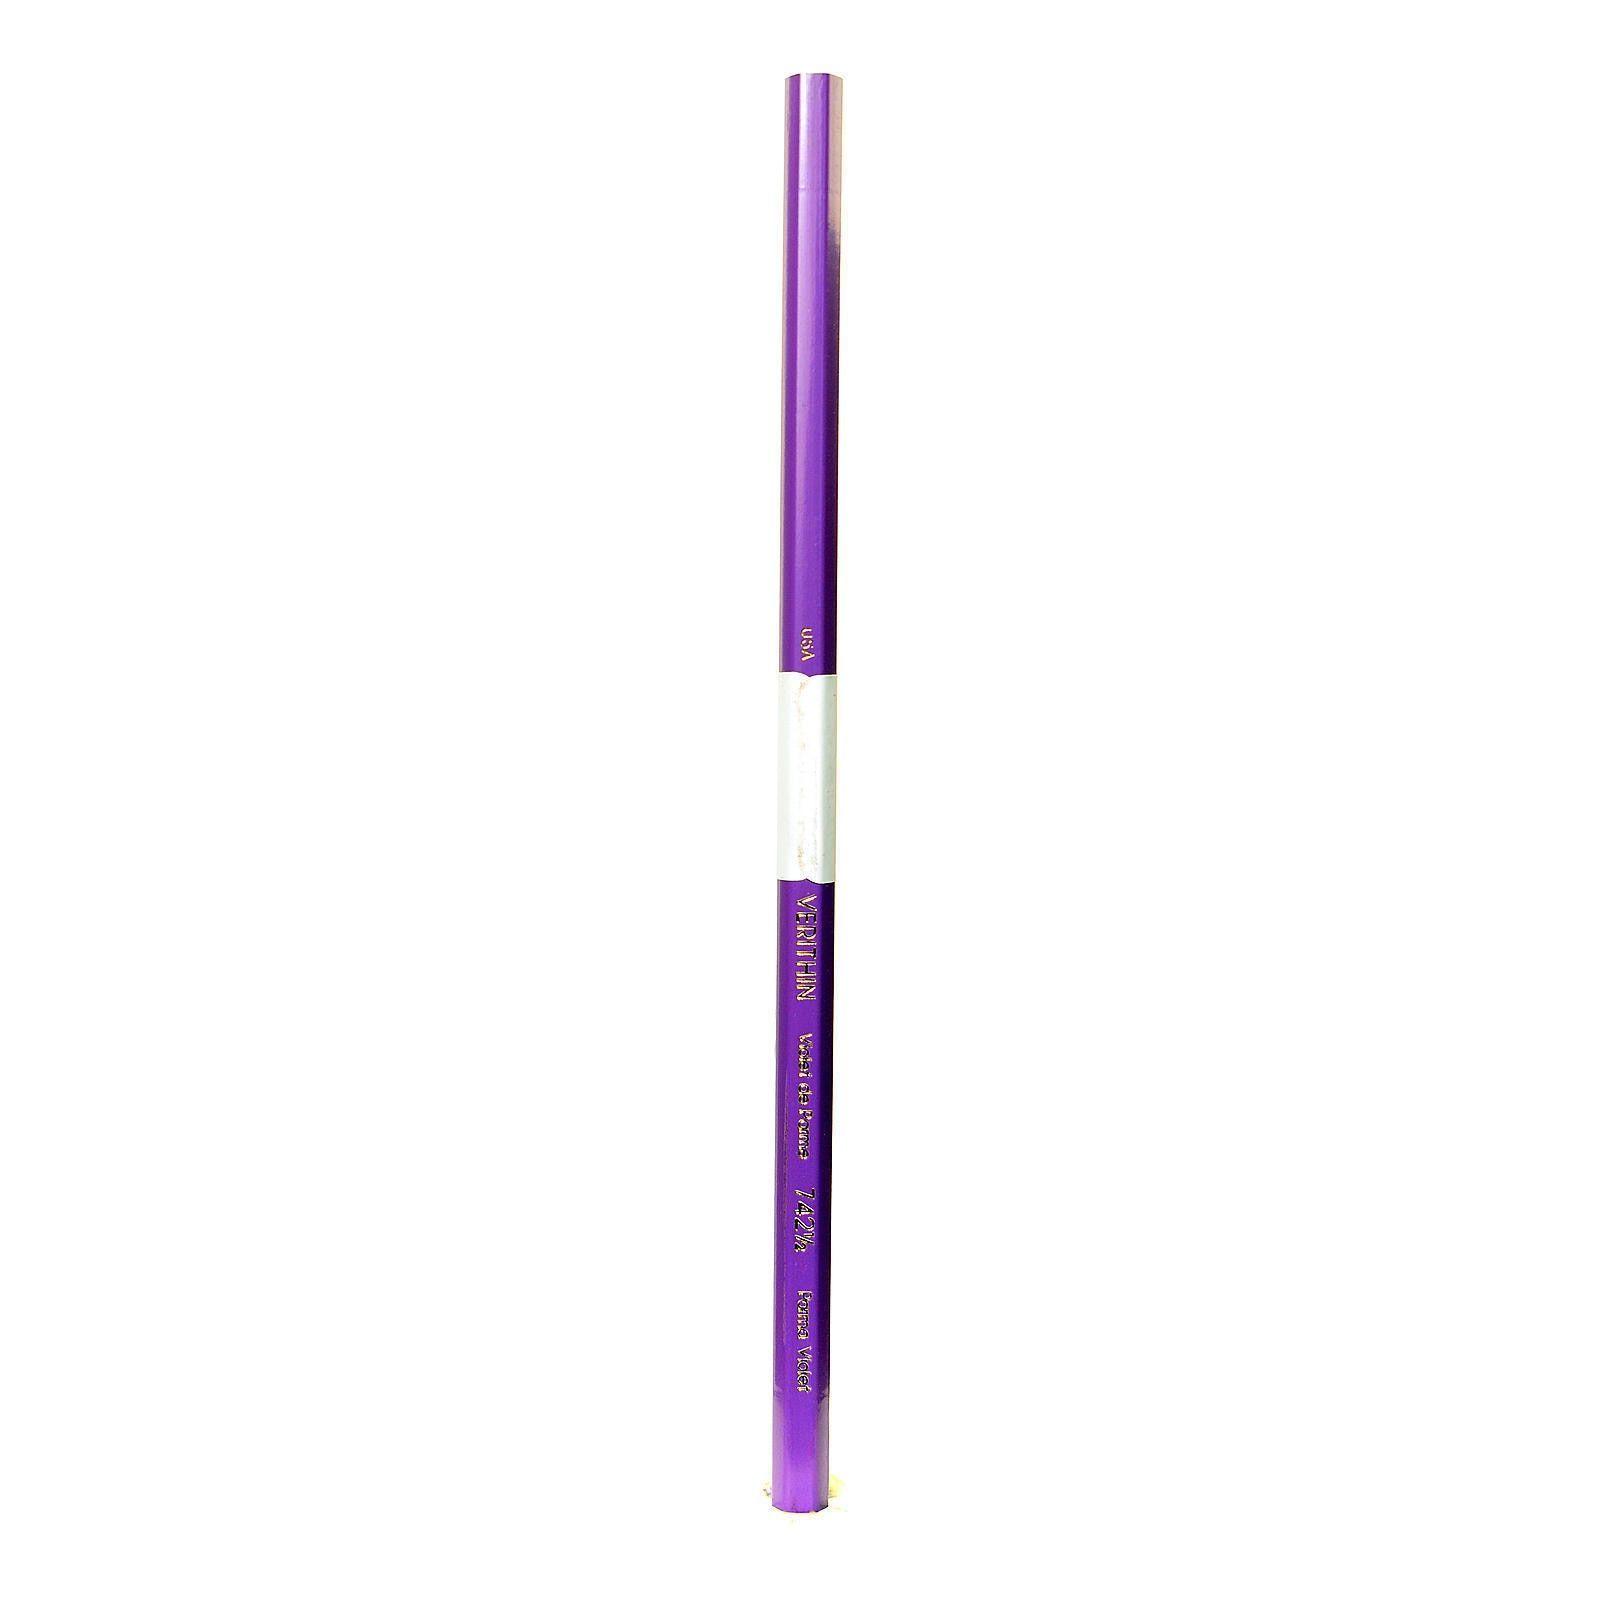 Prismacolor verithin parma products pinterest parma violets prismacolor verithin parma nvjuhfo Choice Image